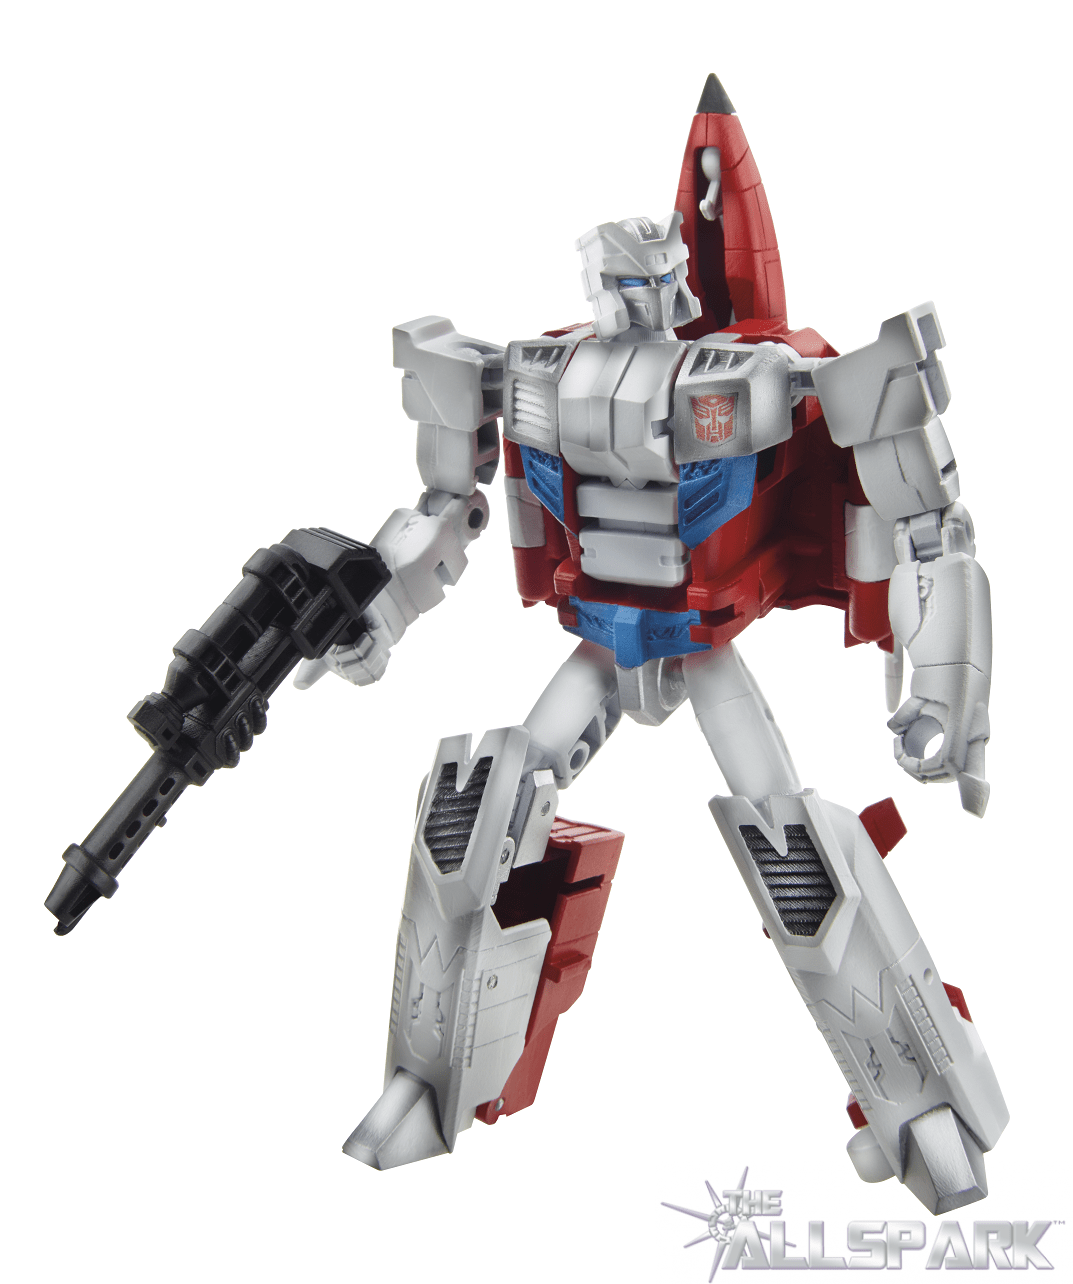 Jouets Transformers Generations: Nouveautés Hasbro - partie 2 - Page 6 Firefly-bot